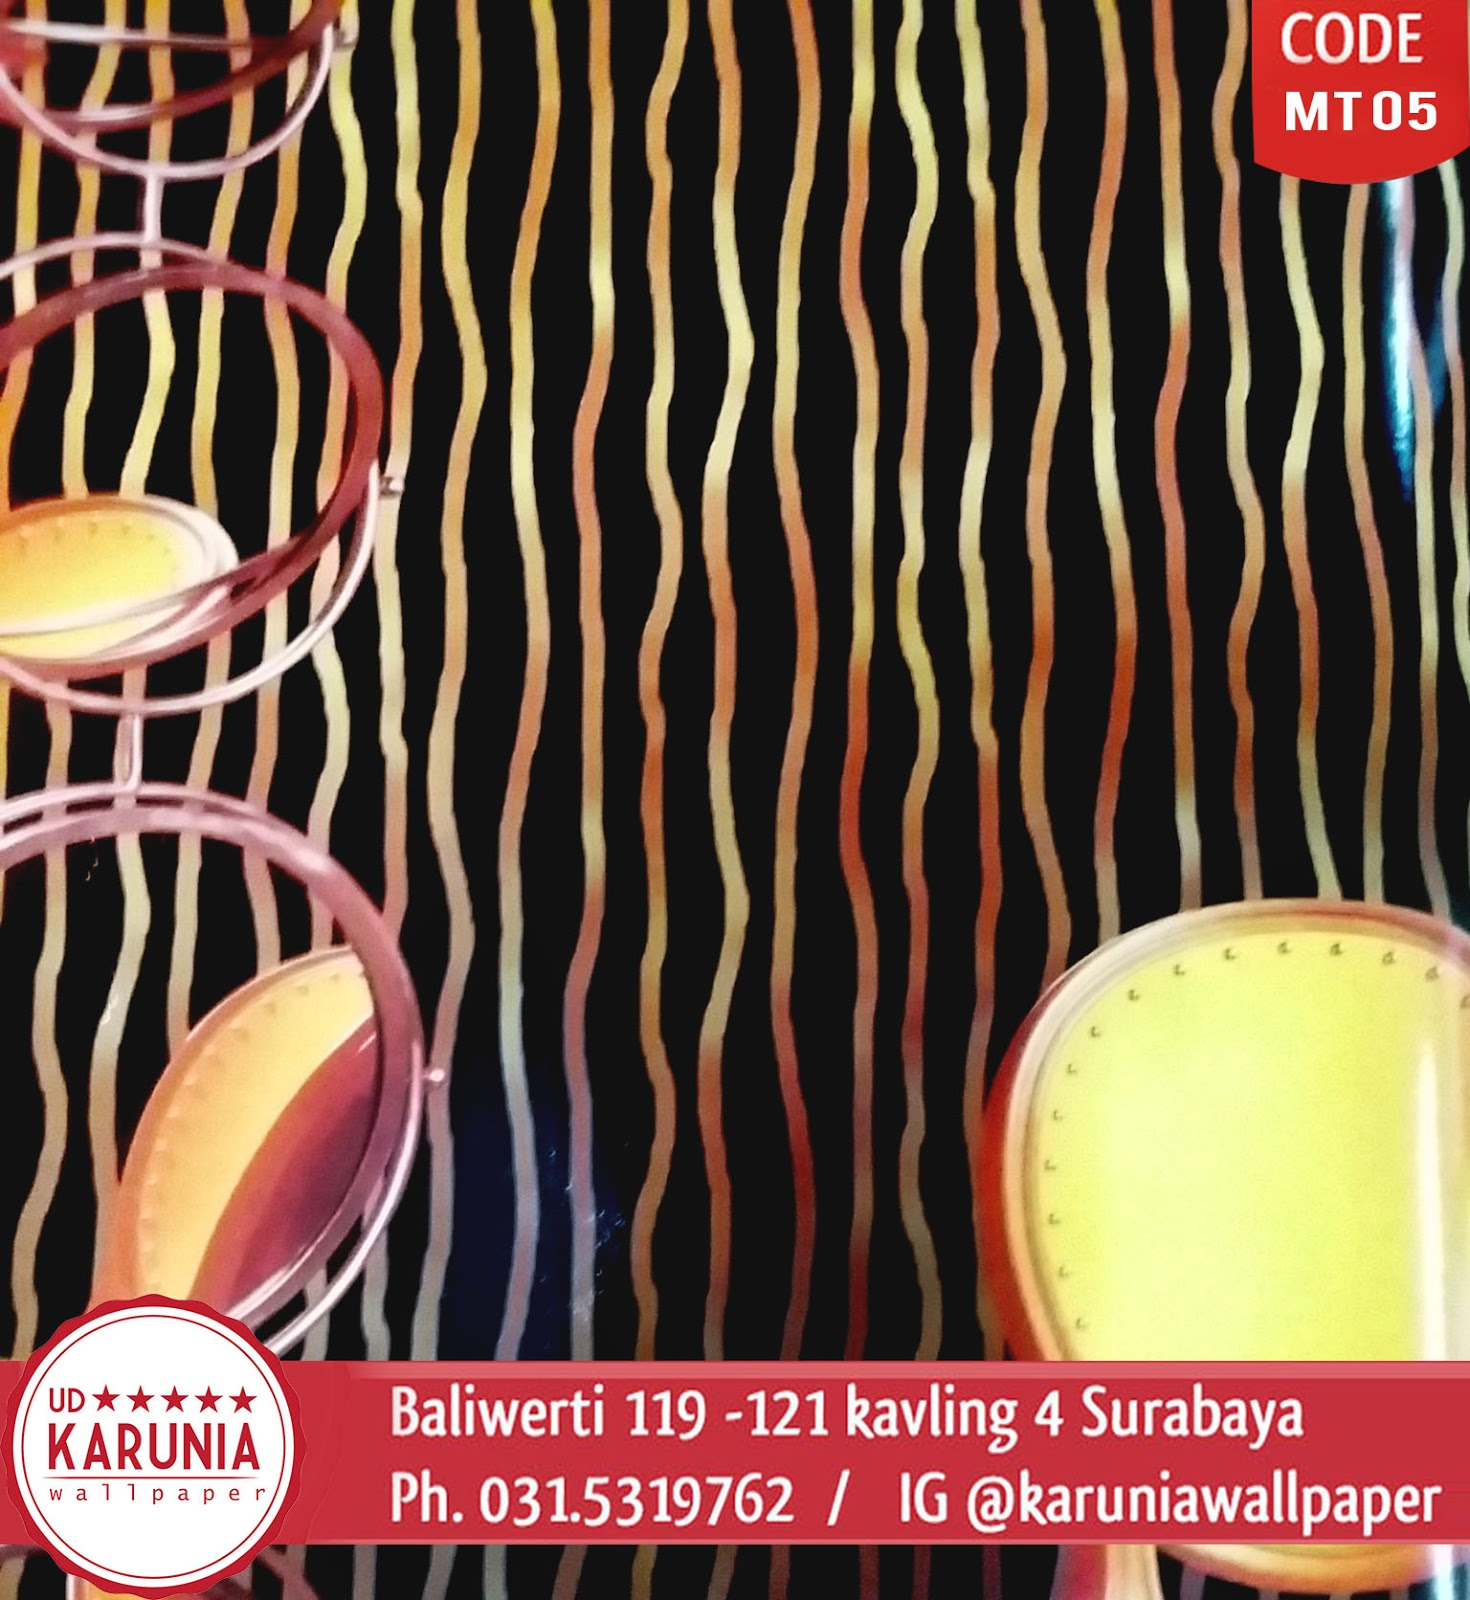 toko jual wallpaper surabaya